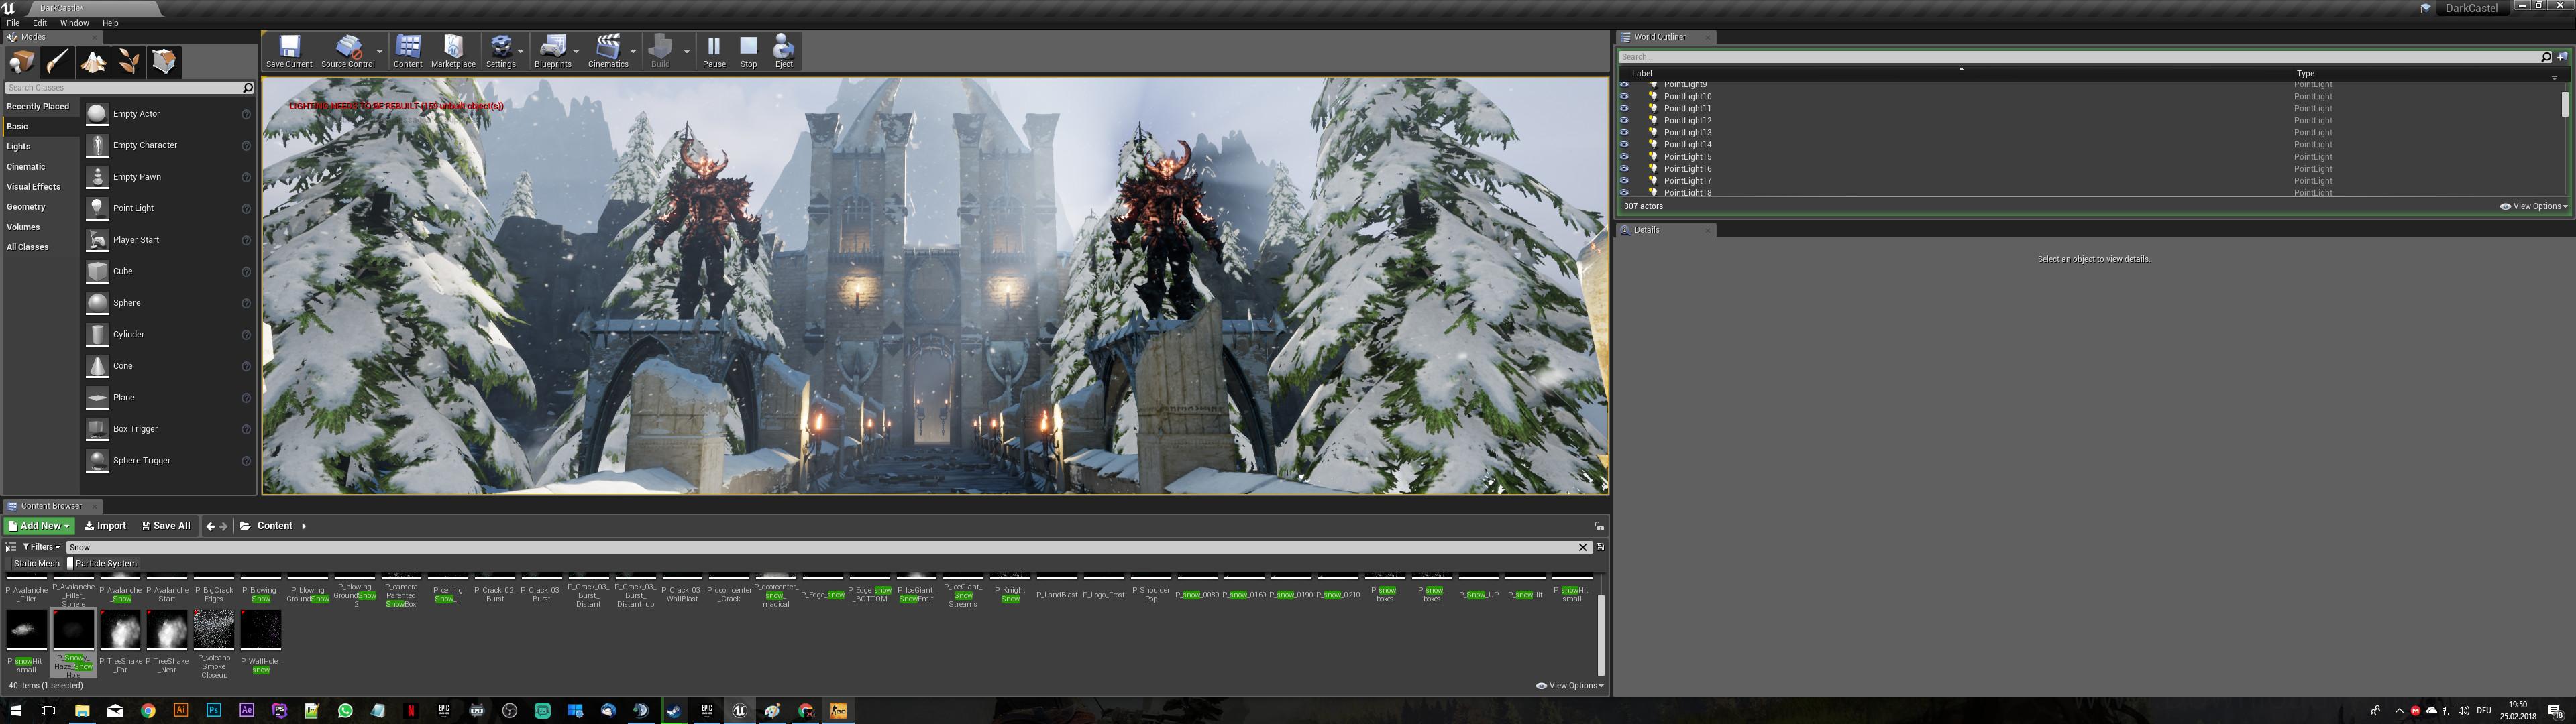 Dark Castle [Unreal Engine 4] [Works In Progress]